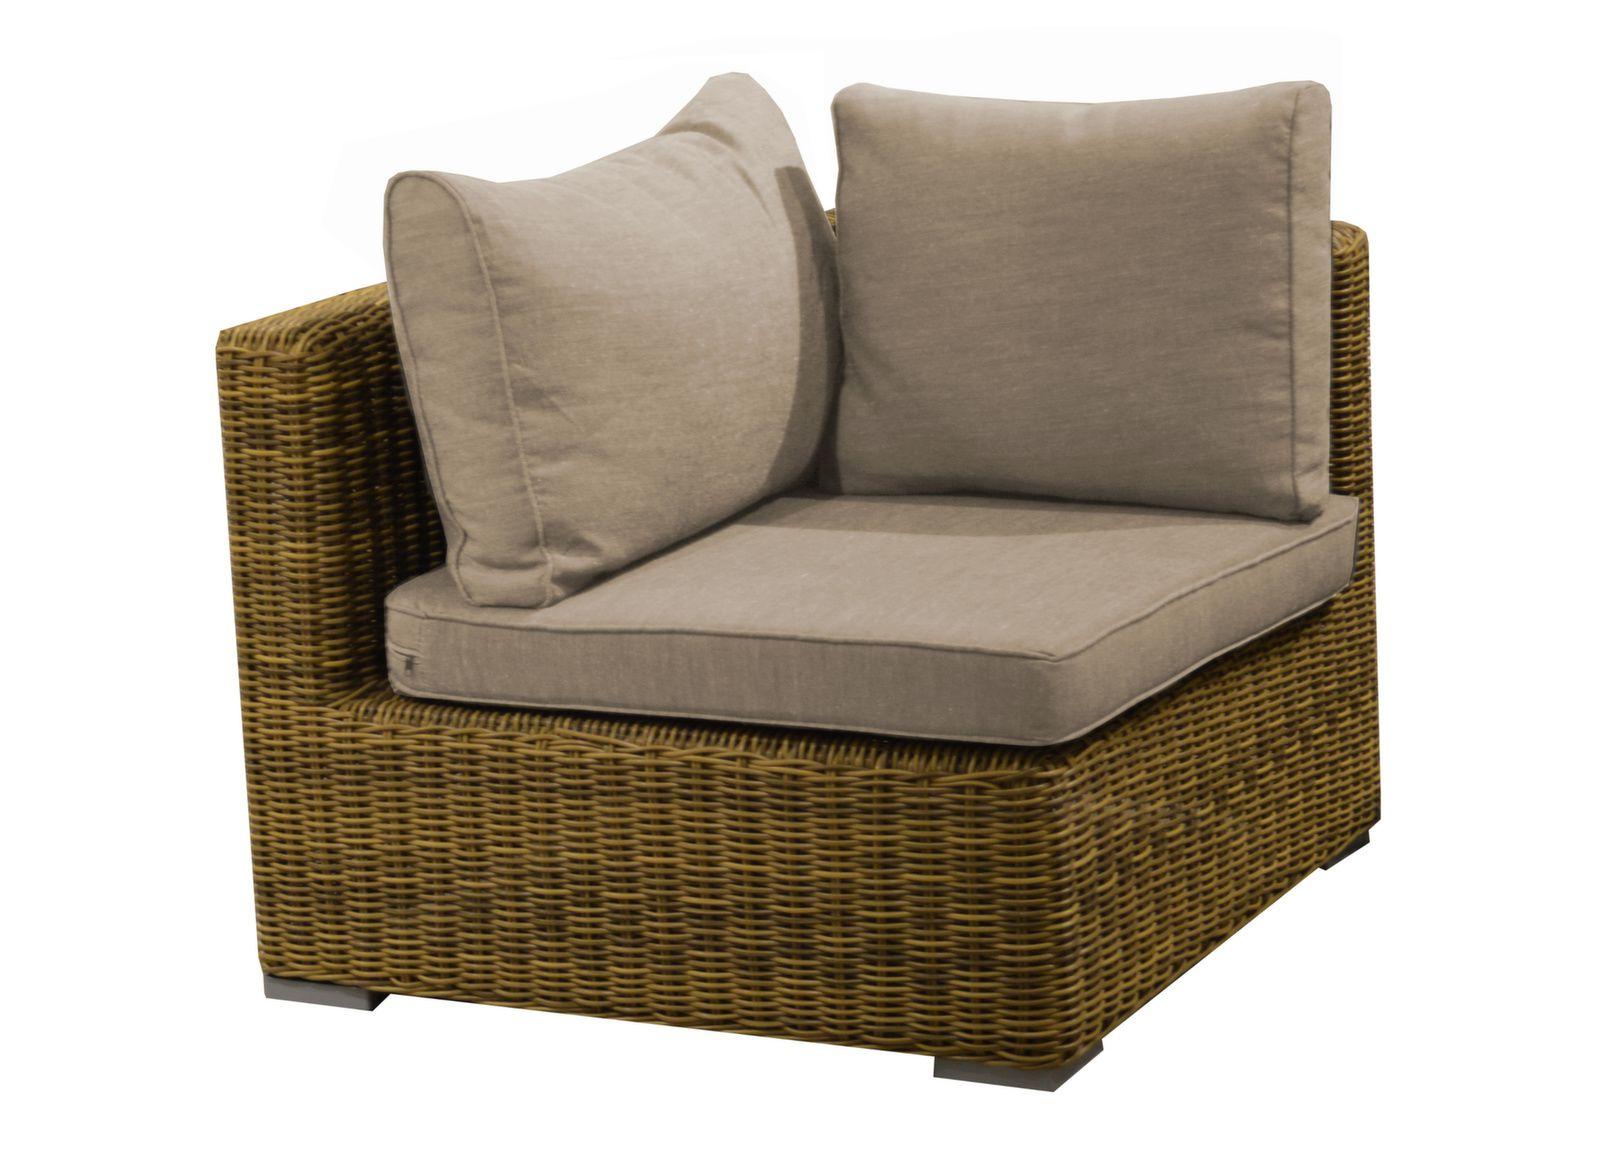 fauteuil d 39 angle rattan mobilier de jardin de d tente. Black Bedroom Furniture Sets. Home Design Ideas